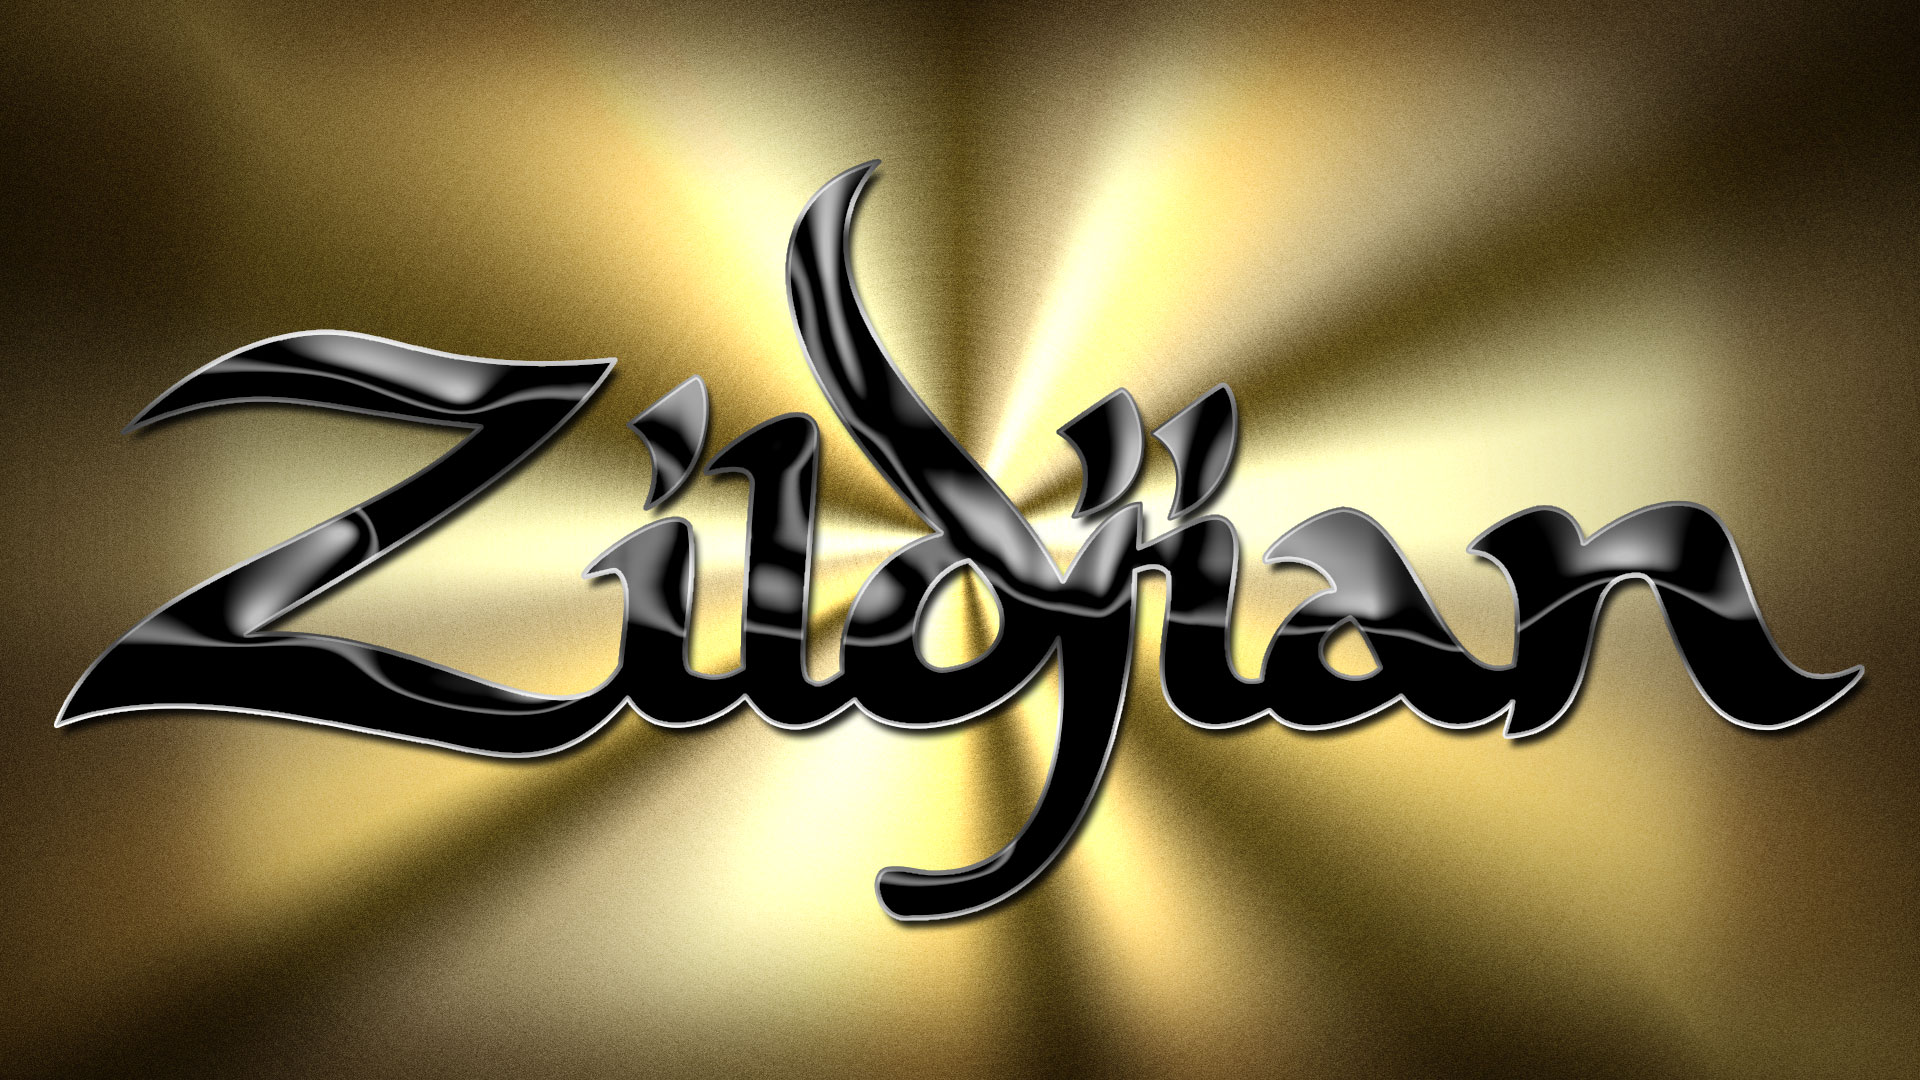 Zildjian logo by Balsavor